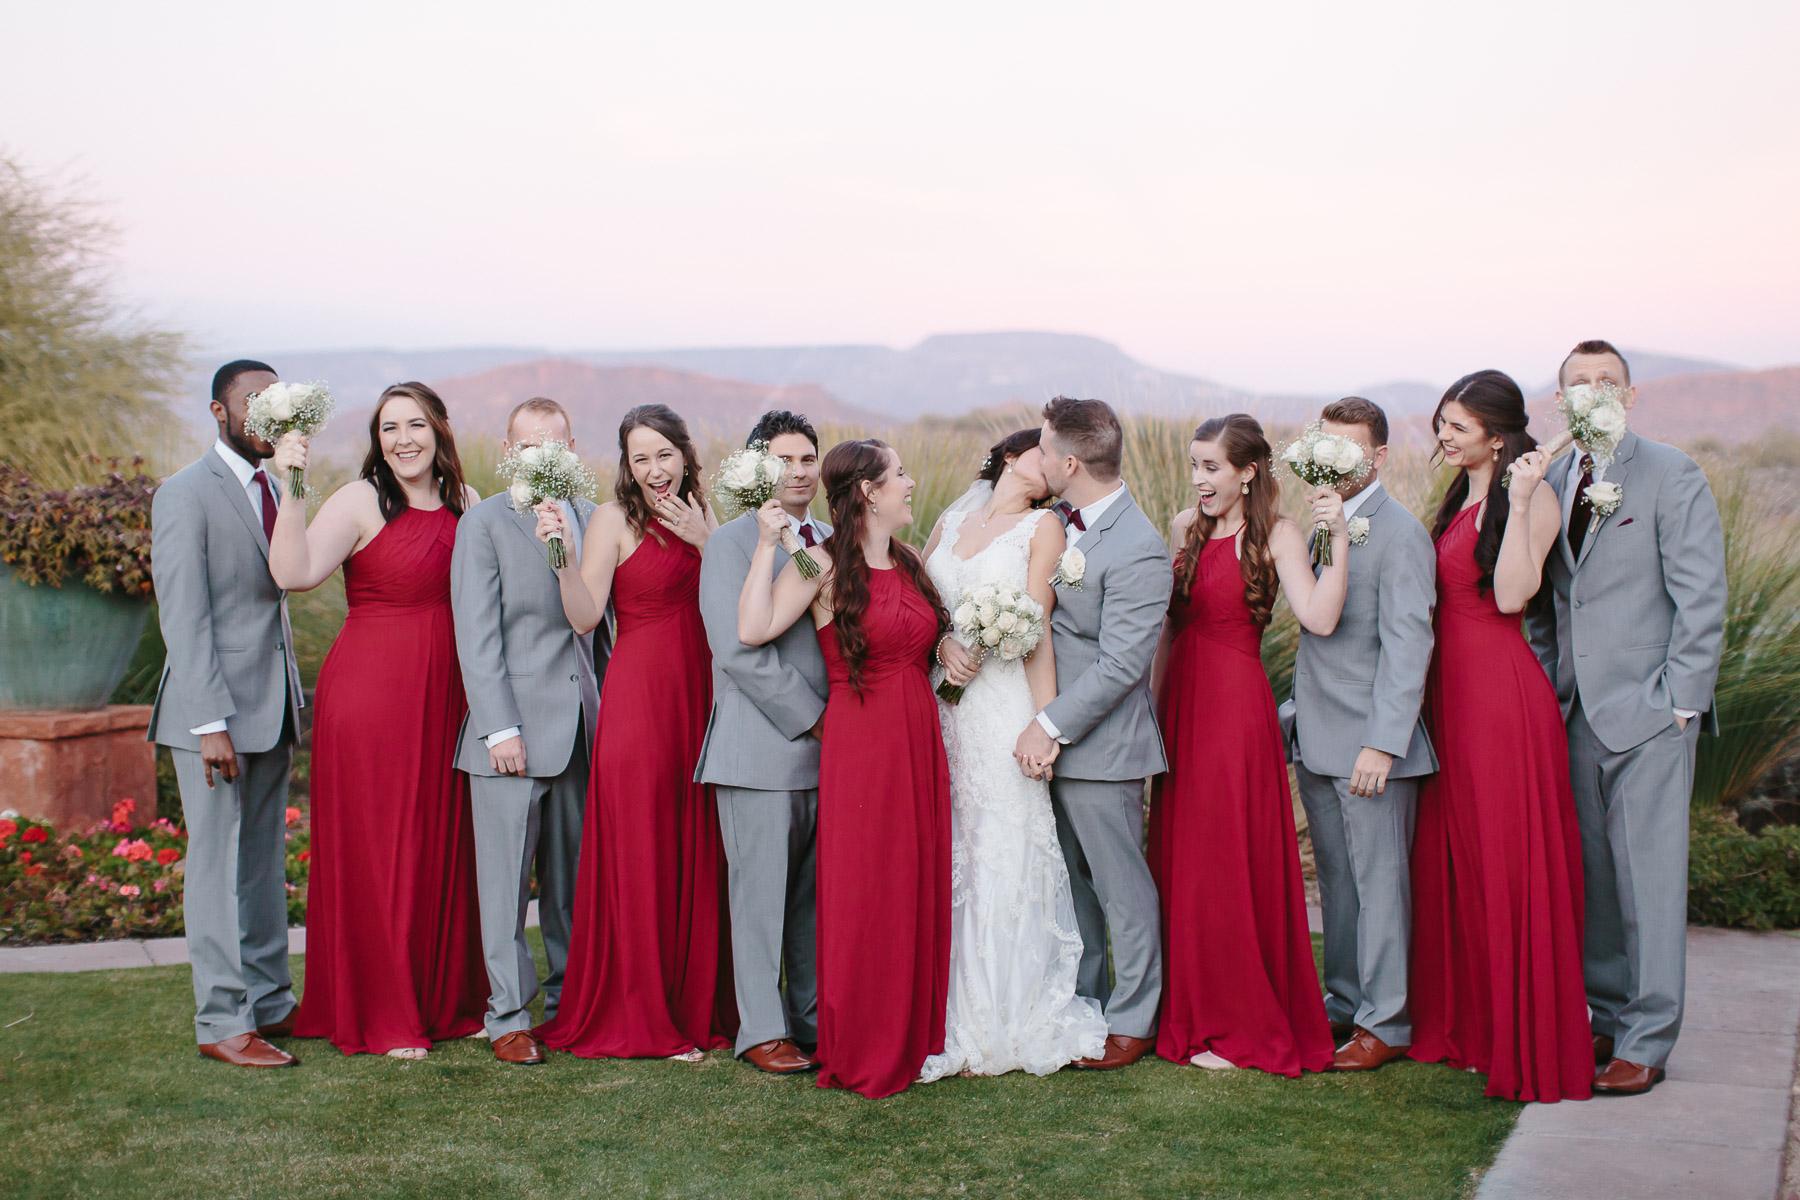 161210-Luxium-Weddings-Arizona-Matt-Jenny-Anthem-Golf-Country-Club-1061.jpg